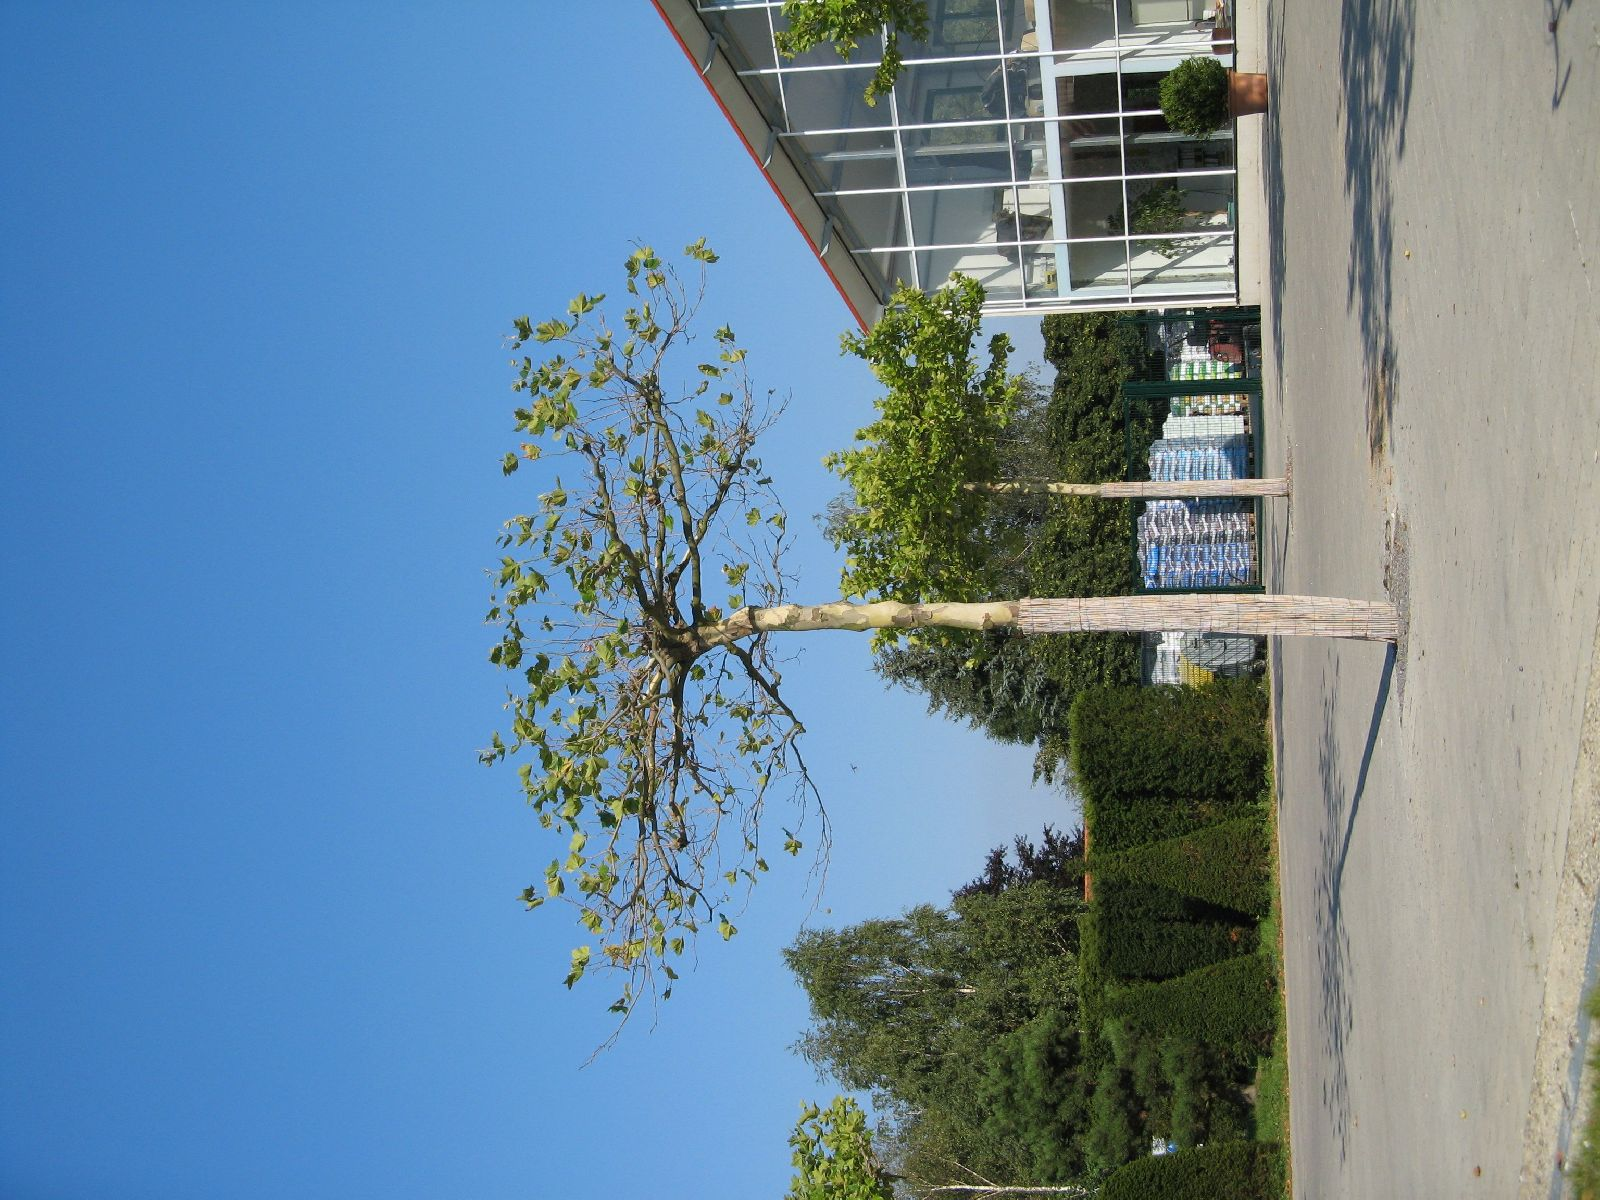 Plants-Trees_Photo_Texture_B_1200